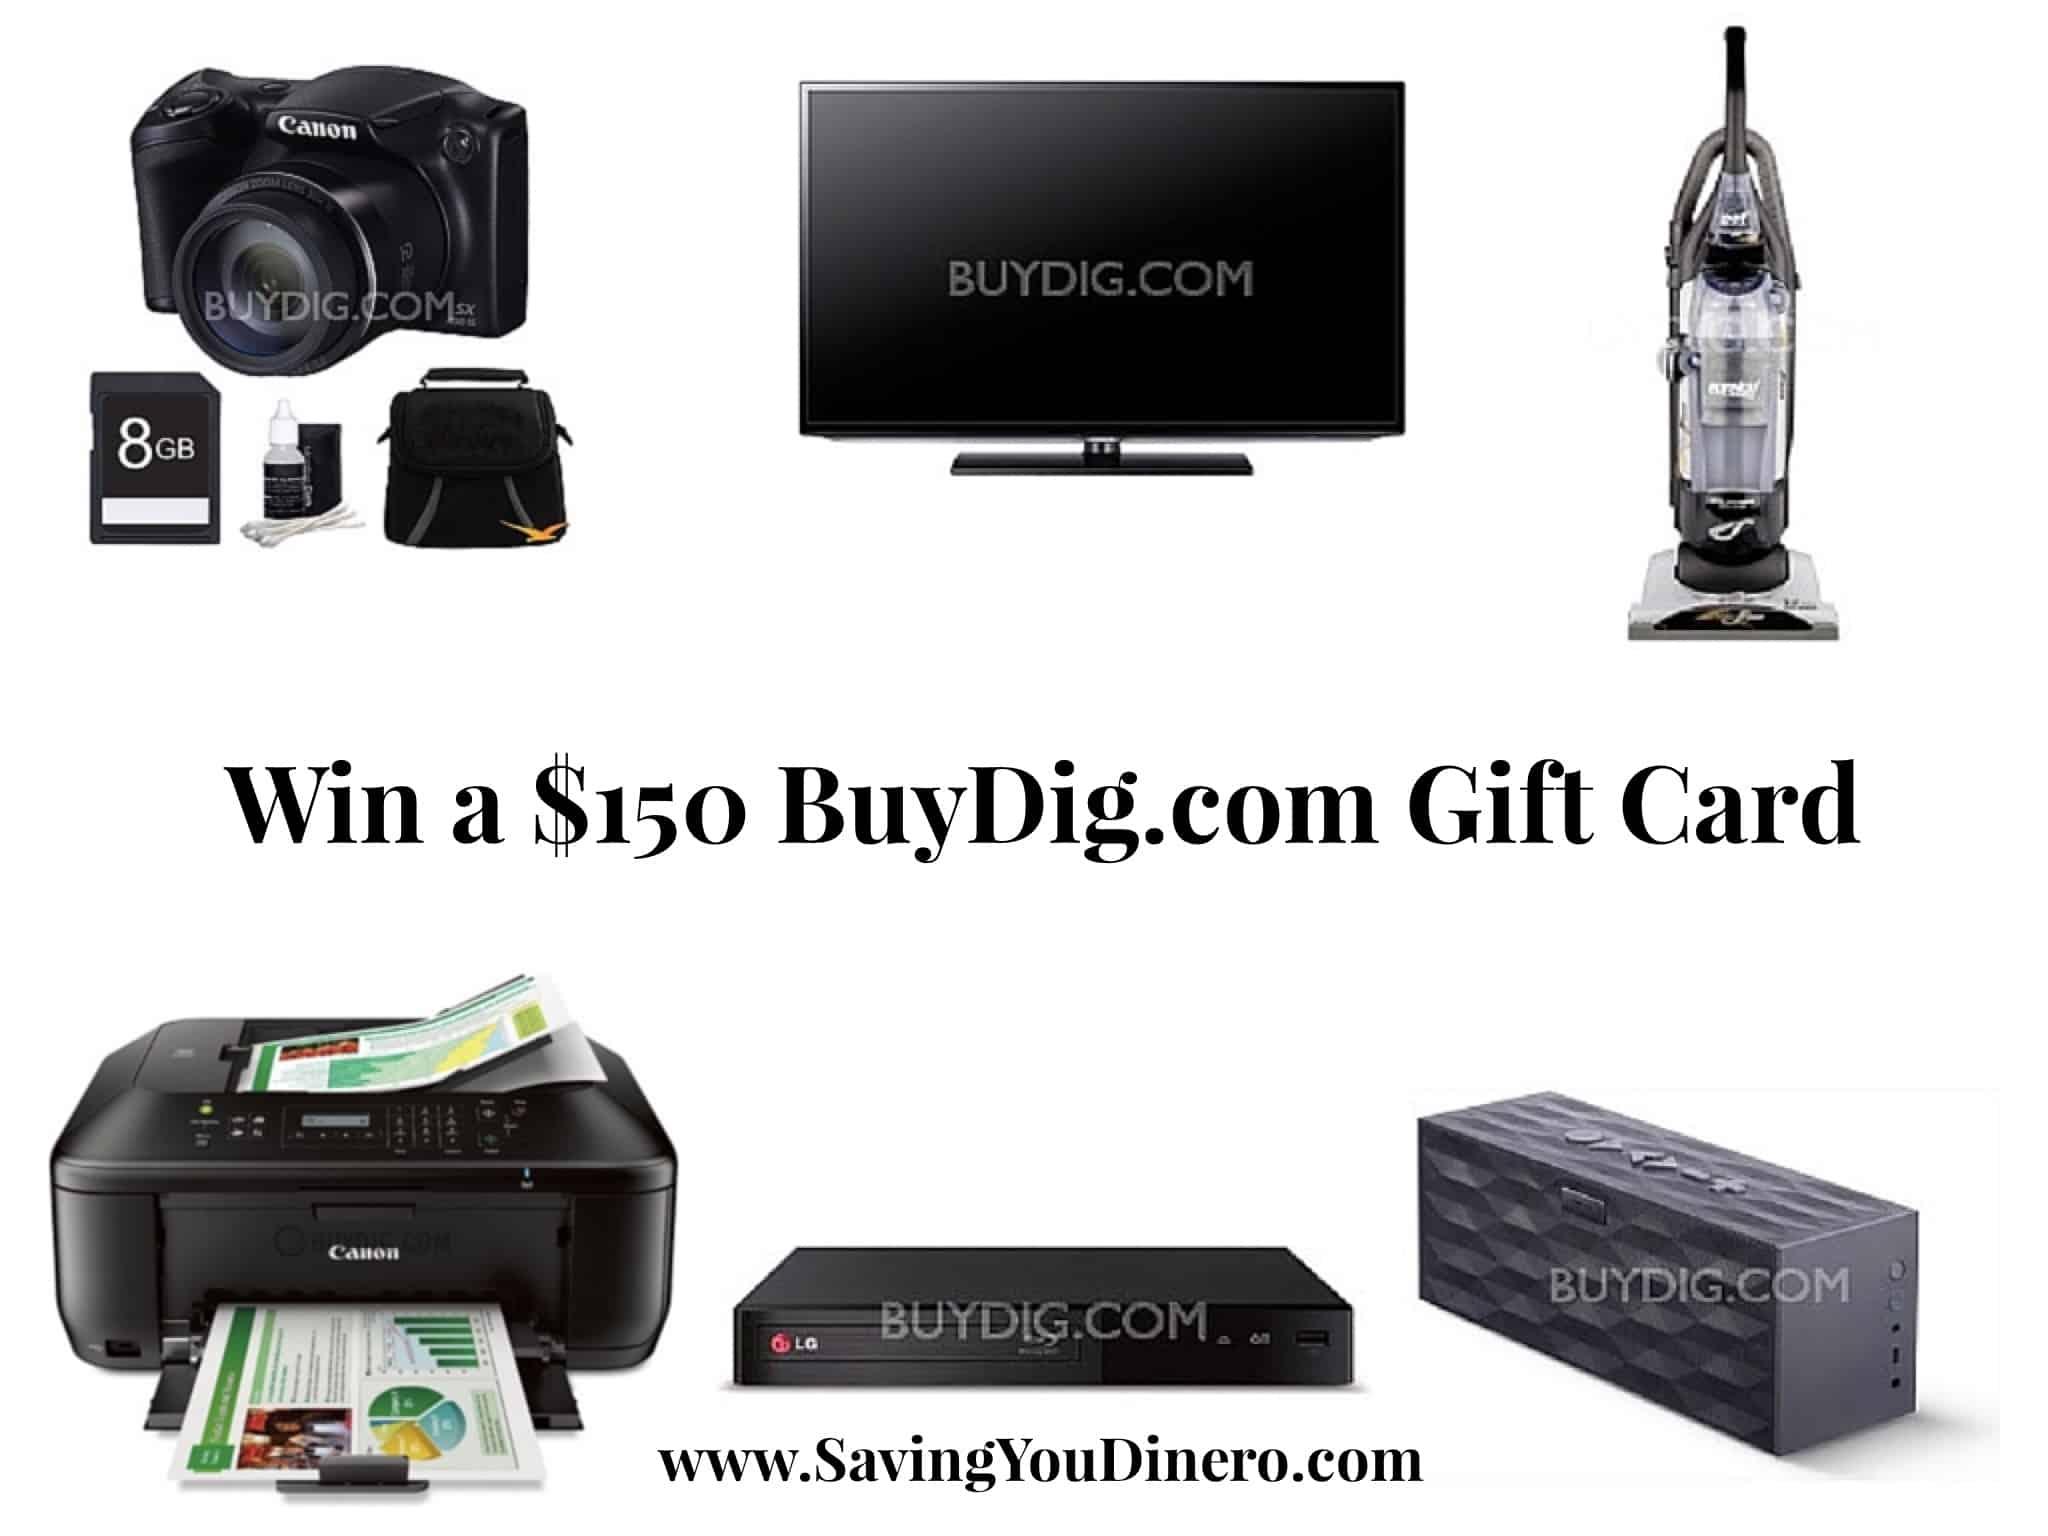 $150 Giveaway for BuyDig.com